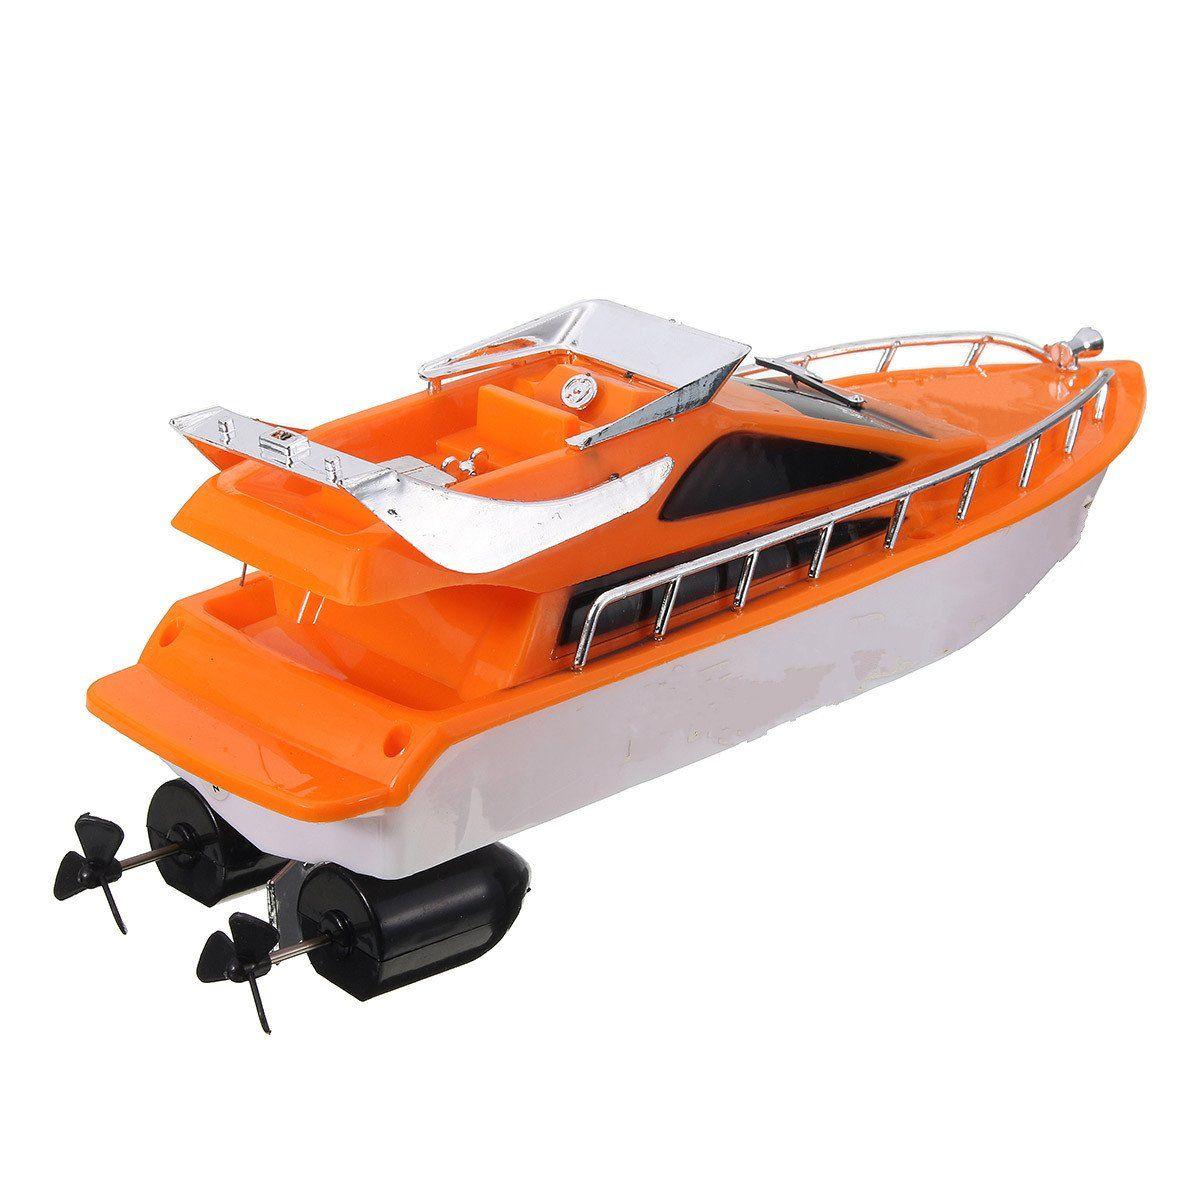 30 26x7.5x9cm Orange Plastic Electric Remote Control Kid Chirdren Toy Speed Boat